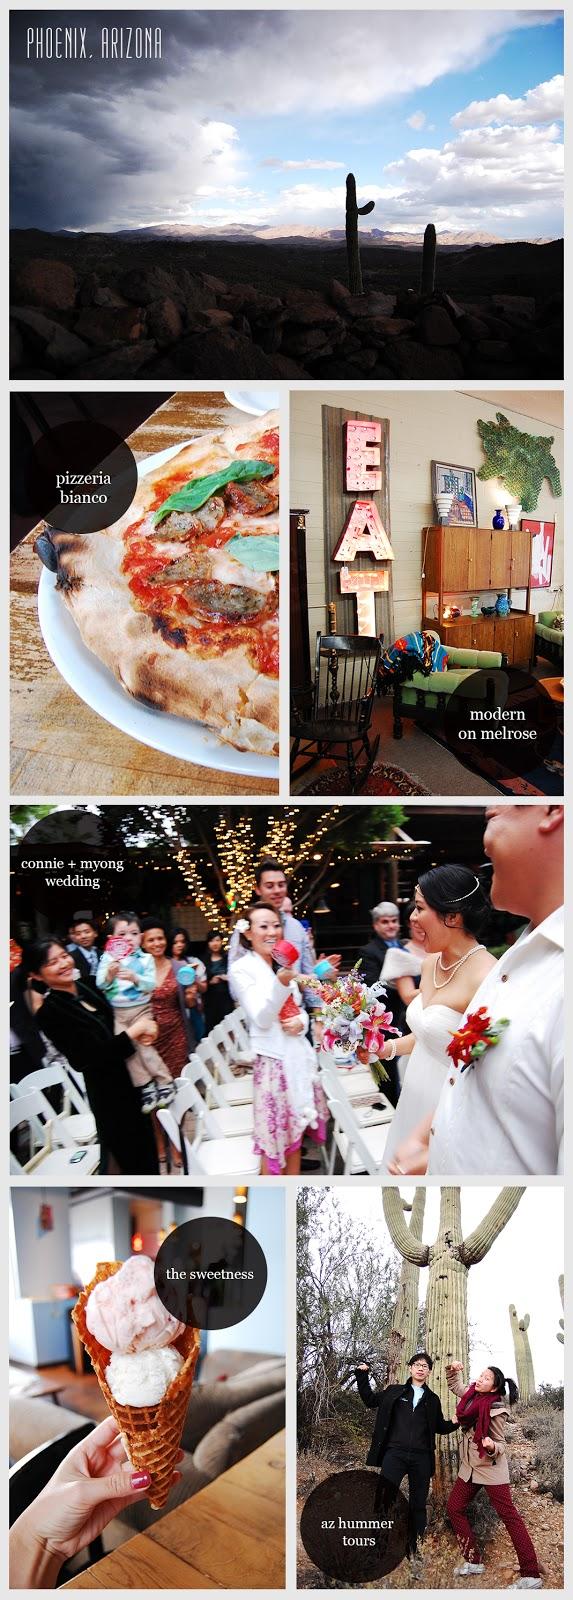 things_to_do_in_phoenix_arizona_thrift_shopping_pizzeria_bianco_the_sweetness_az_hummer_tours_outdoors.jpg